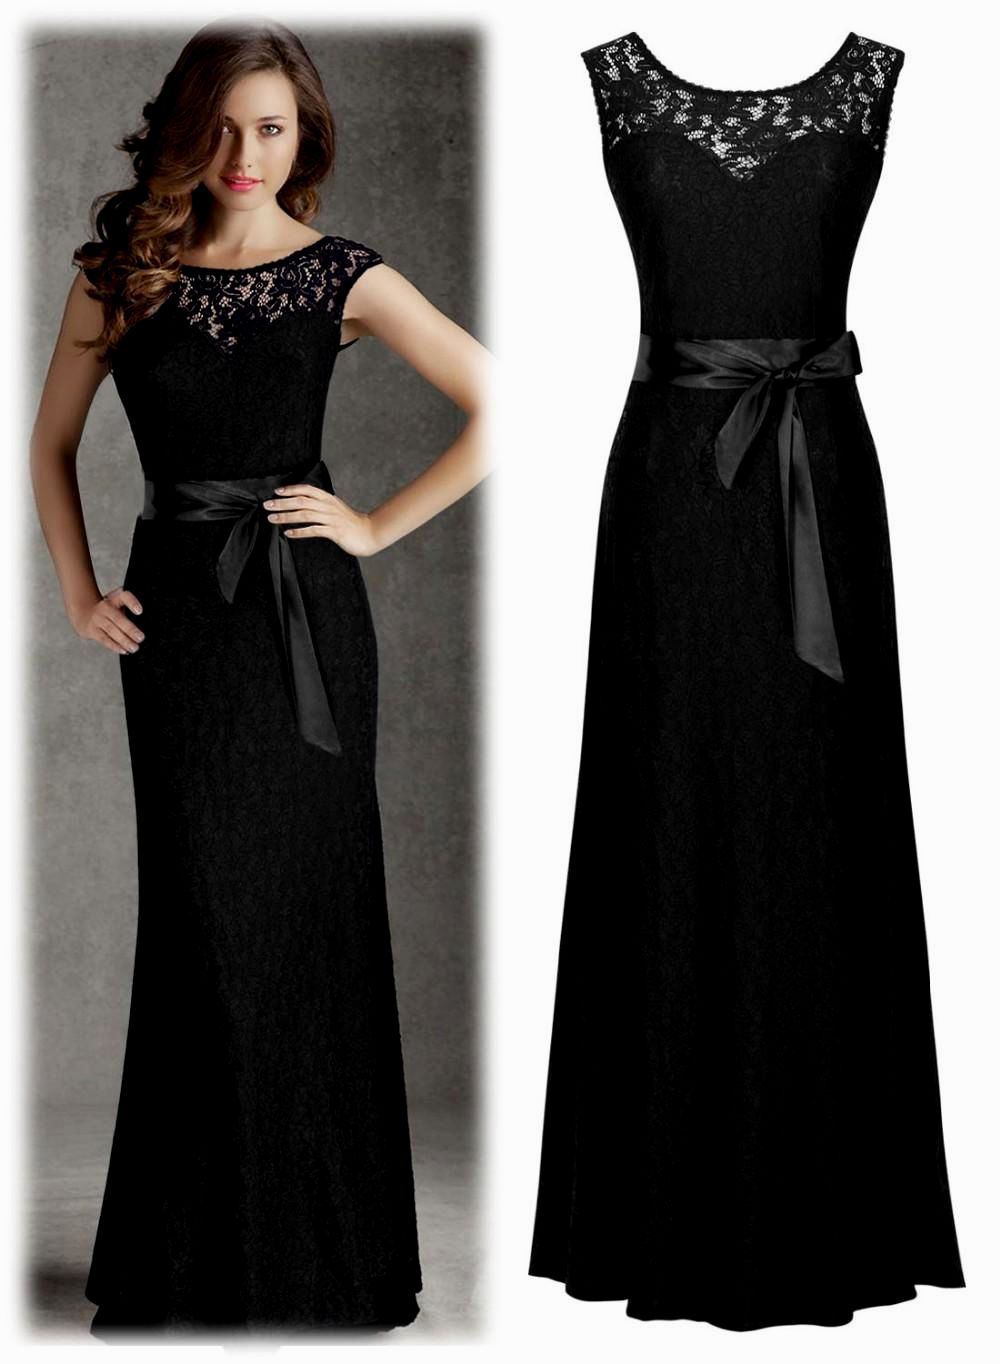 black tie dresses for wedding photo - 1